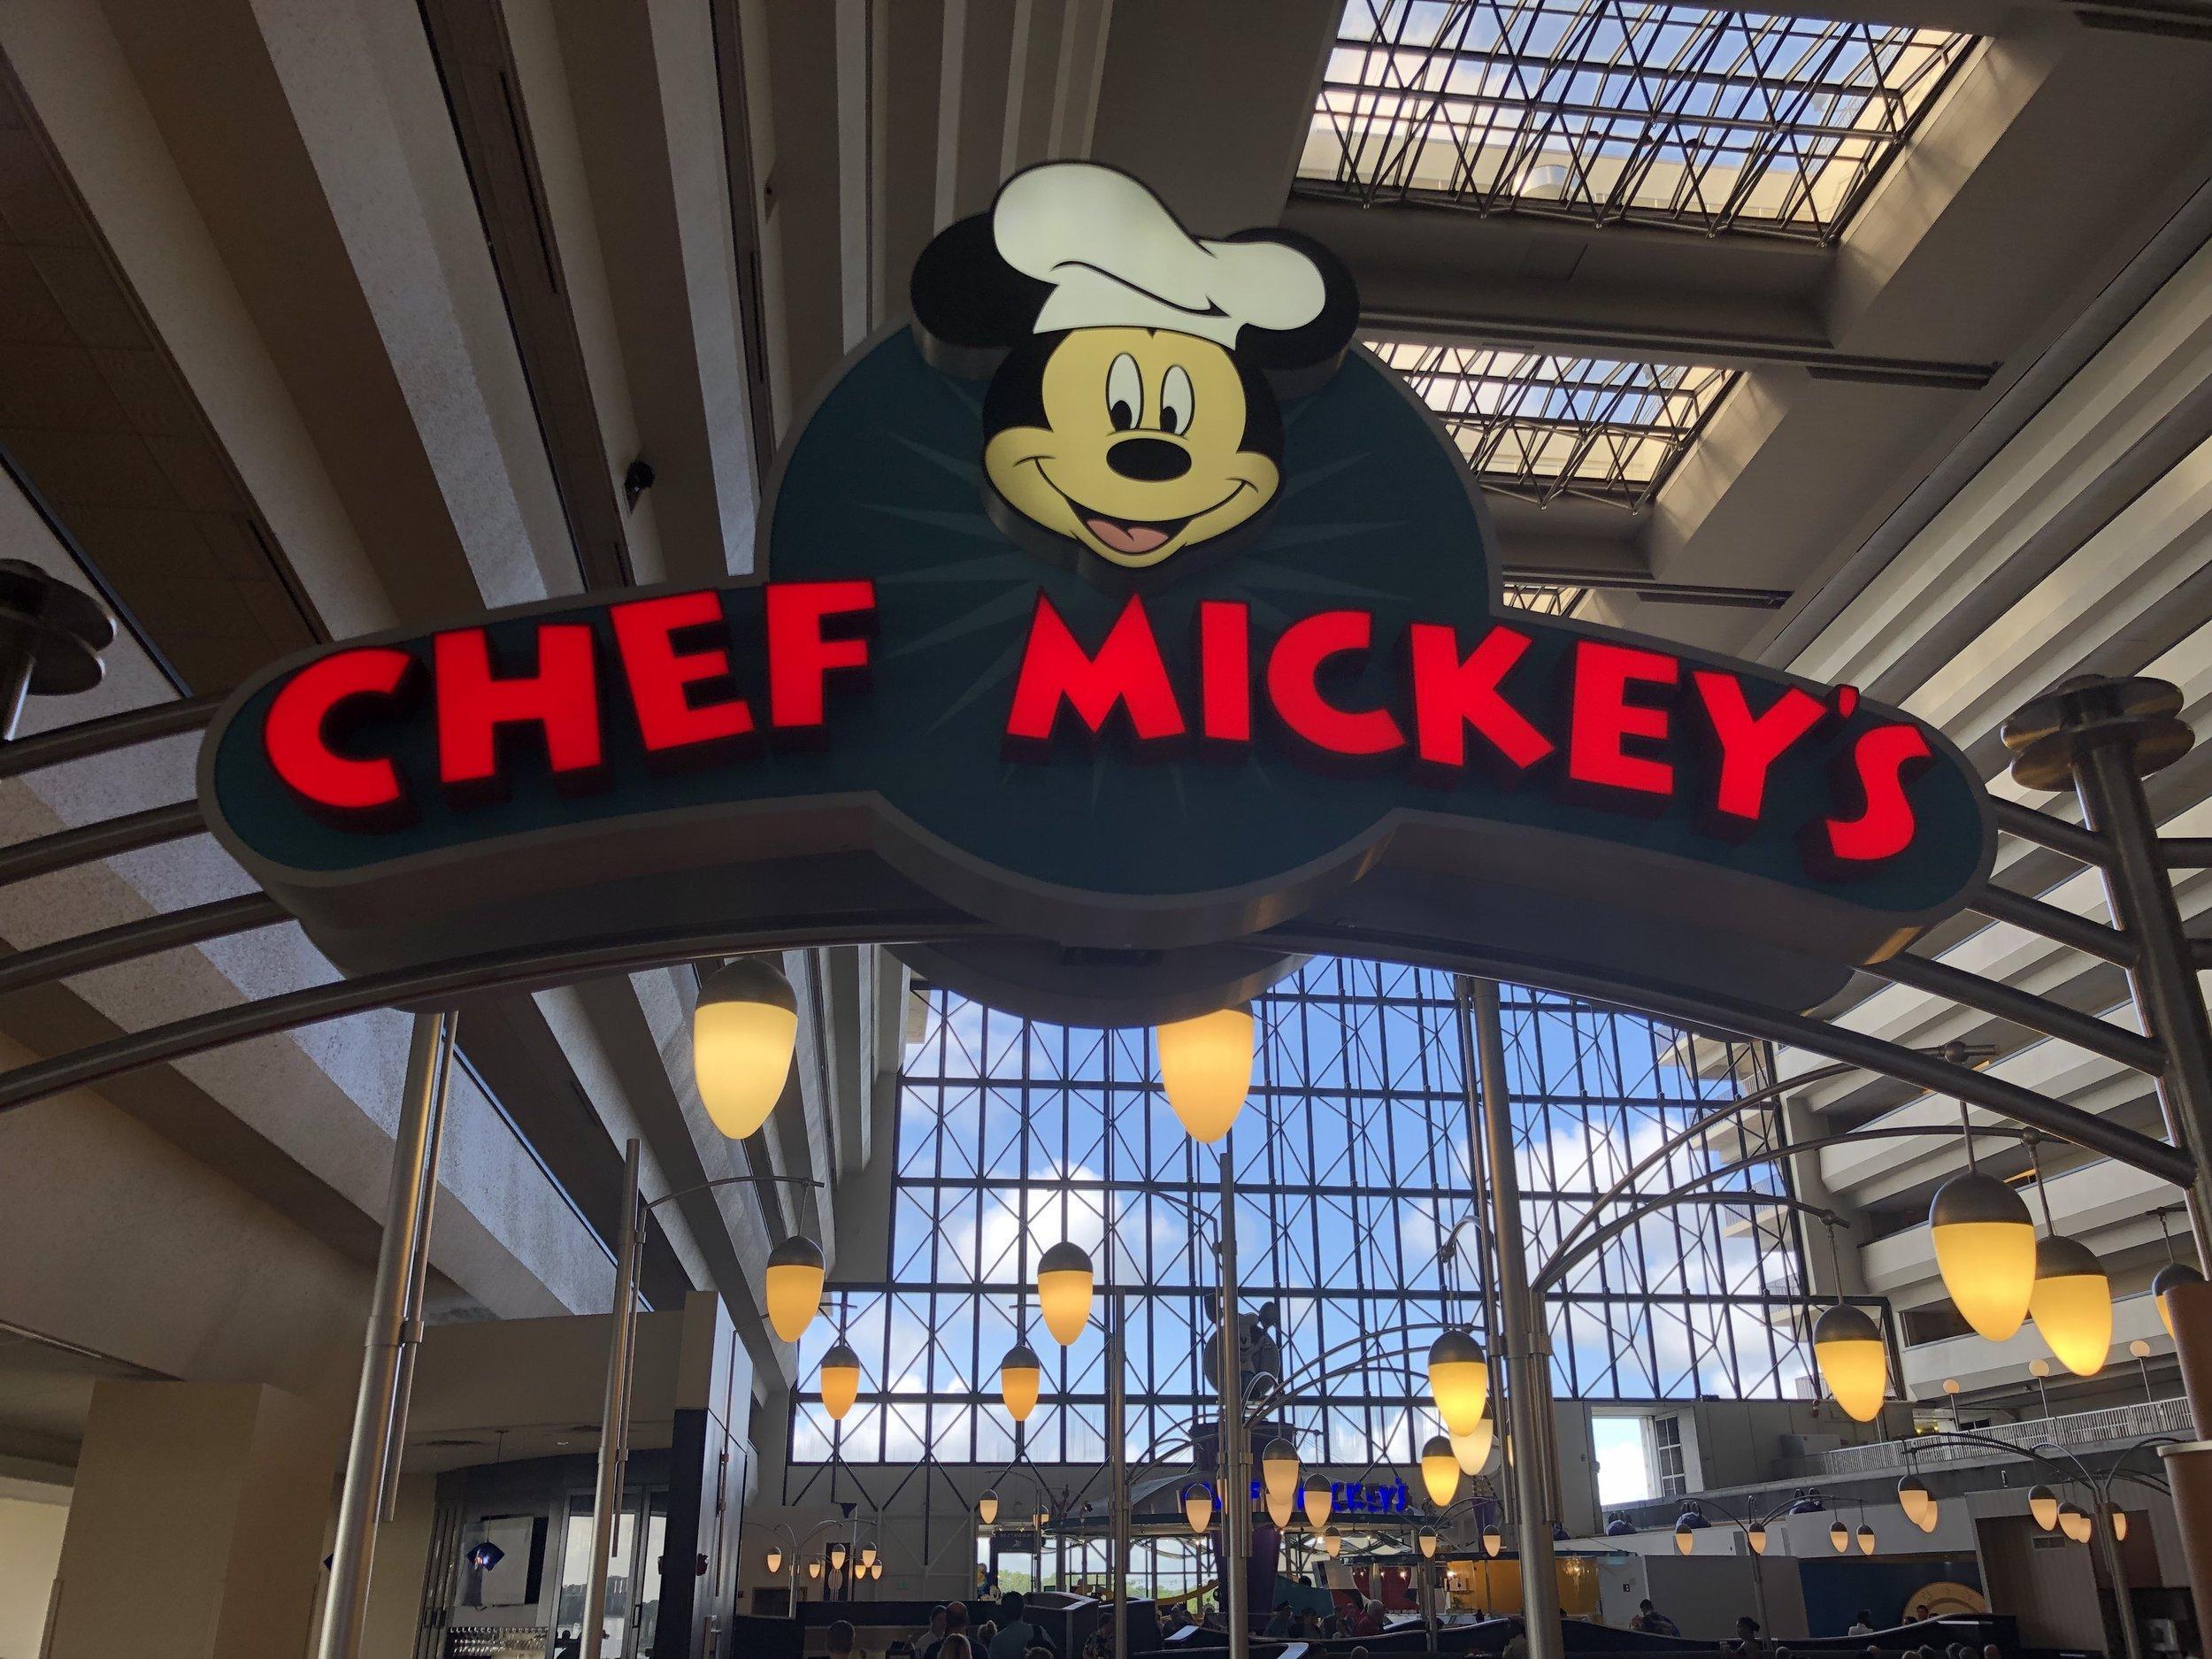 chef mickey's entrance - disney's contemporary resort